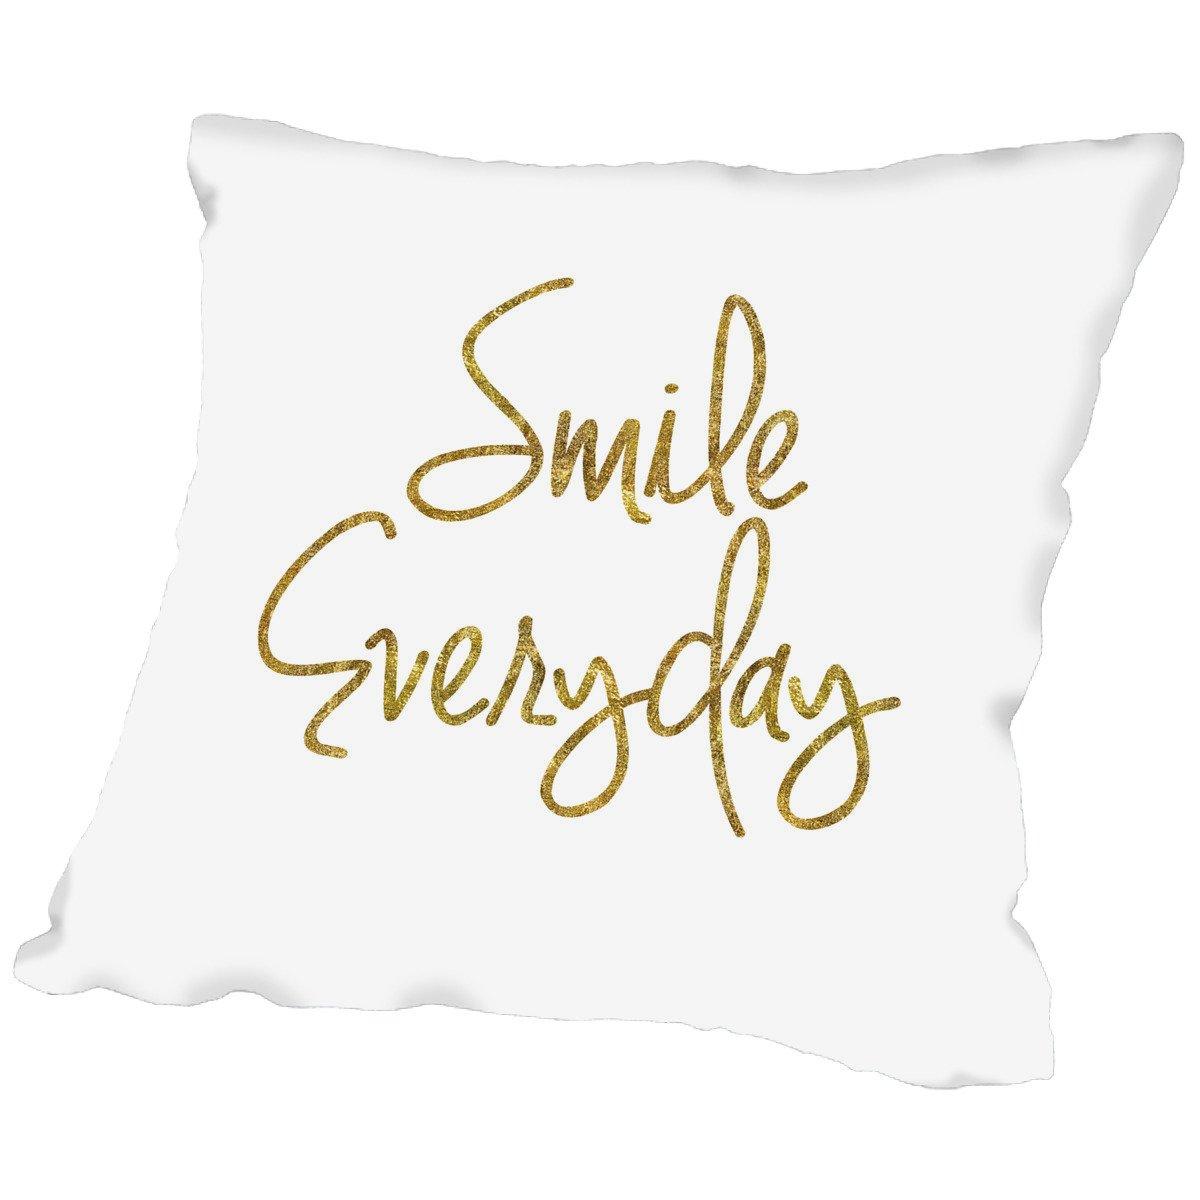 American Flat Smile Everyday Pillow by Brett Wilson, 18'' x 18''